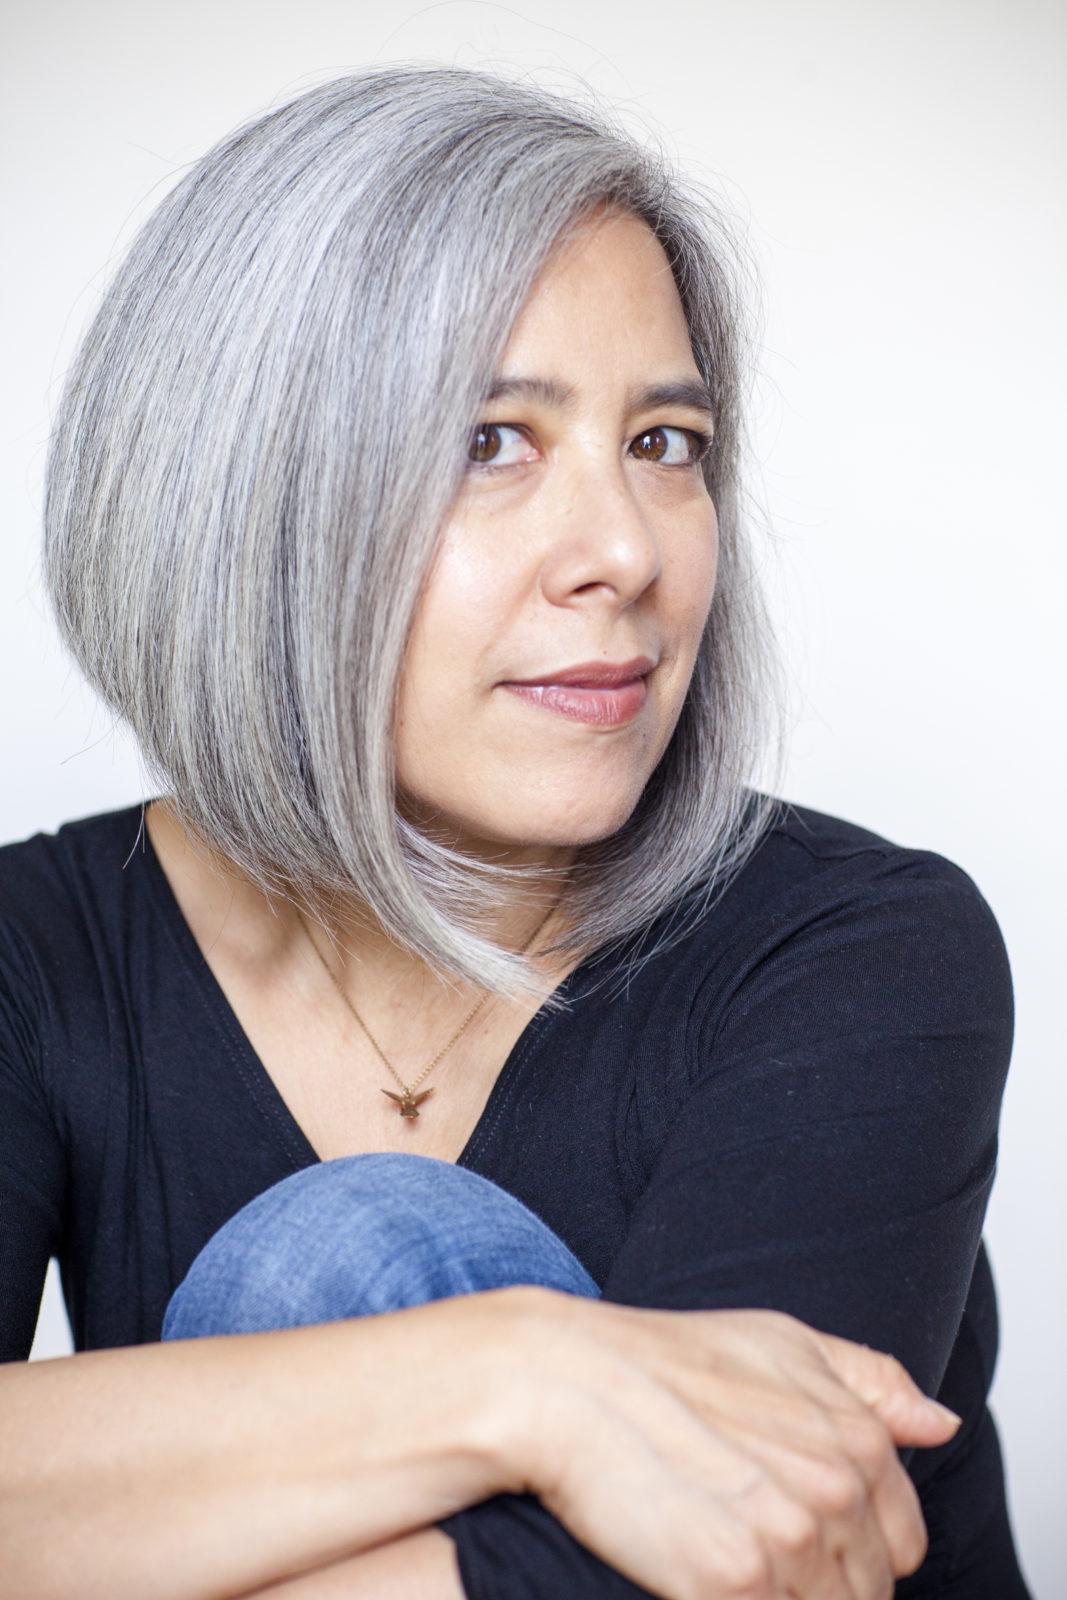 Susan Choi by Heather Weston